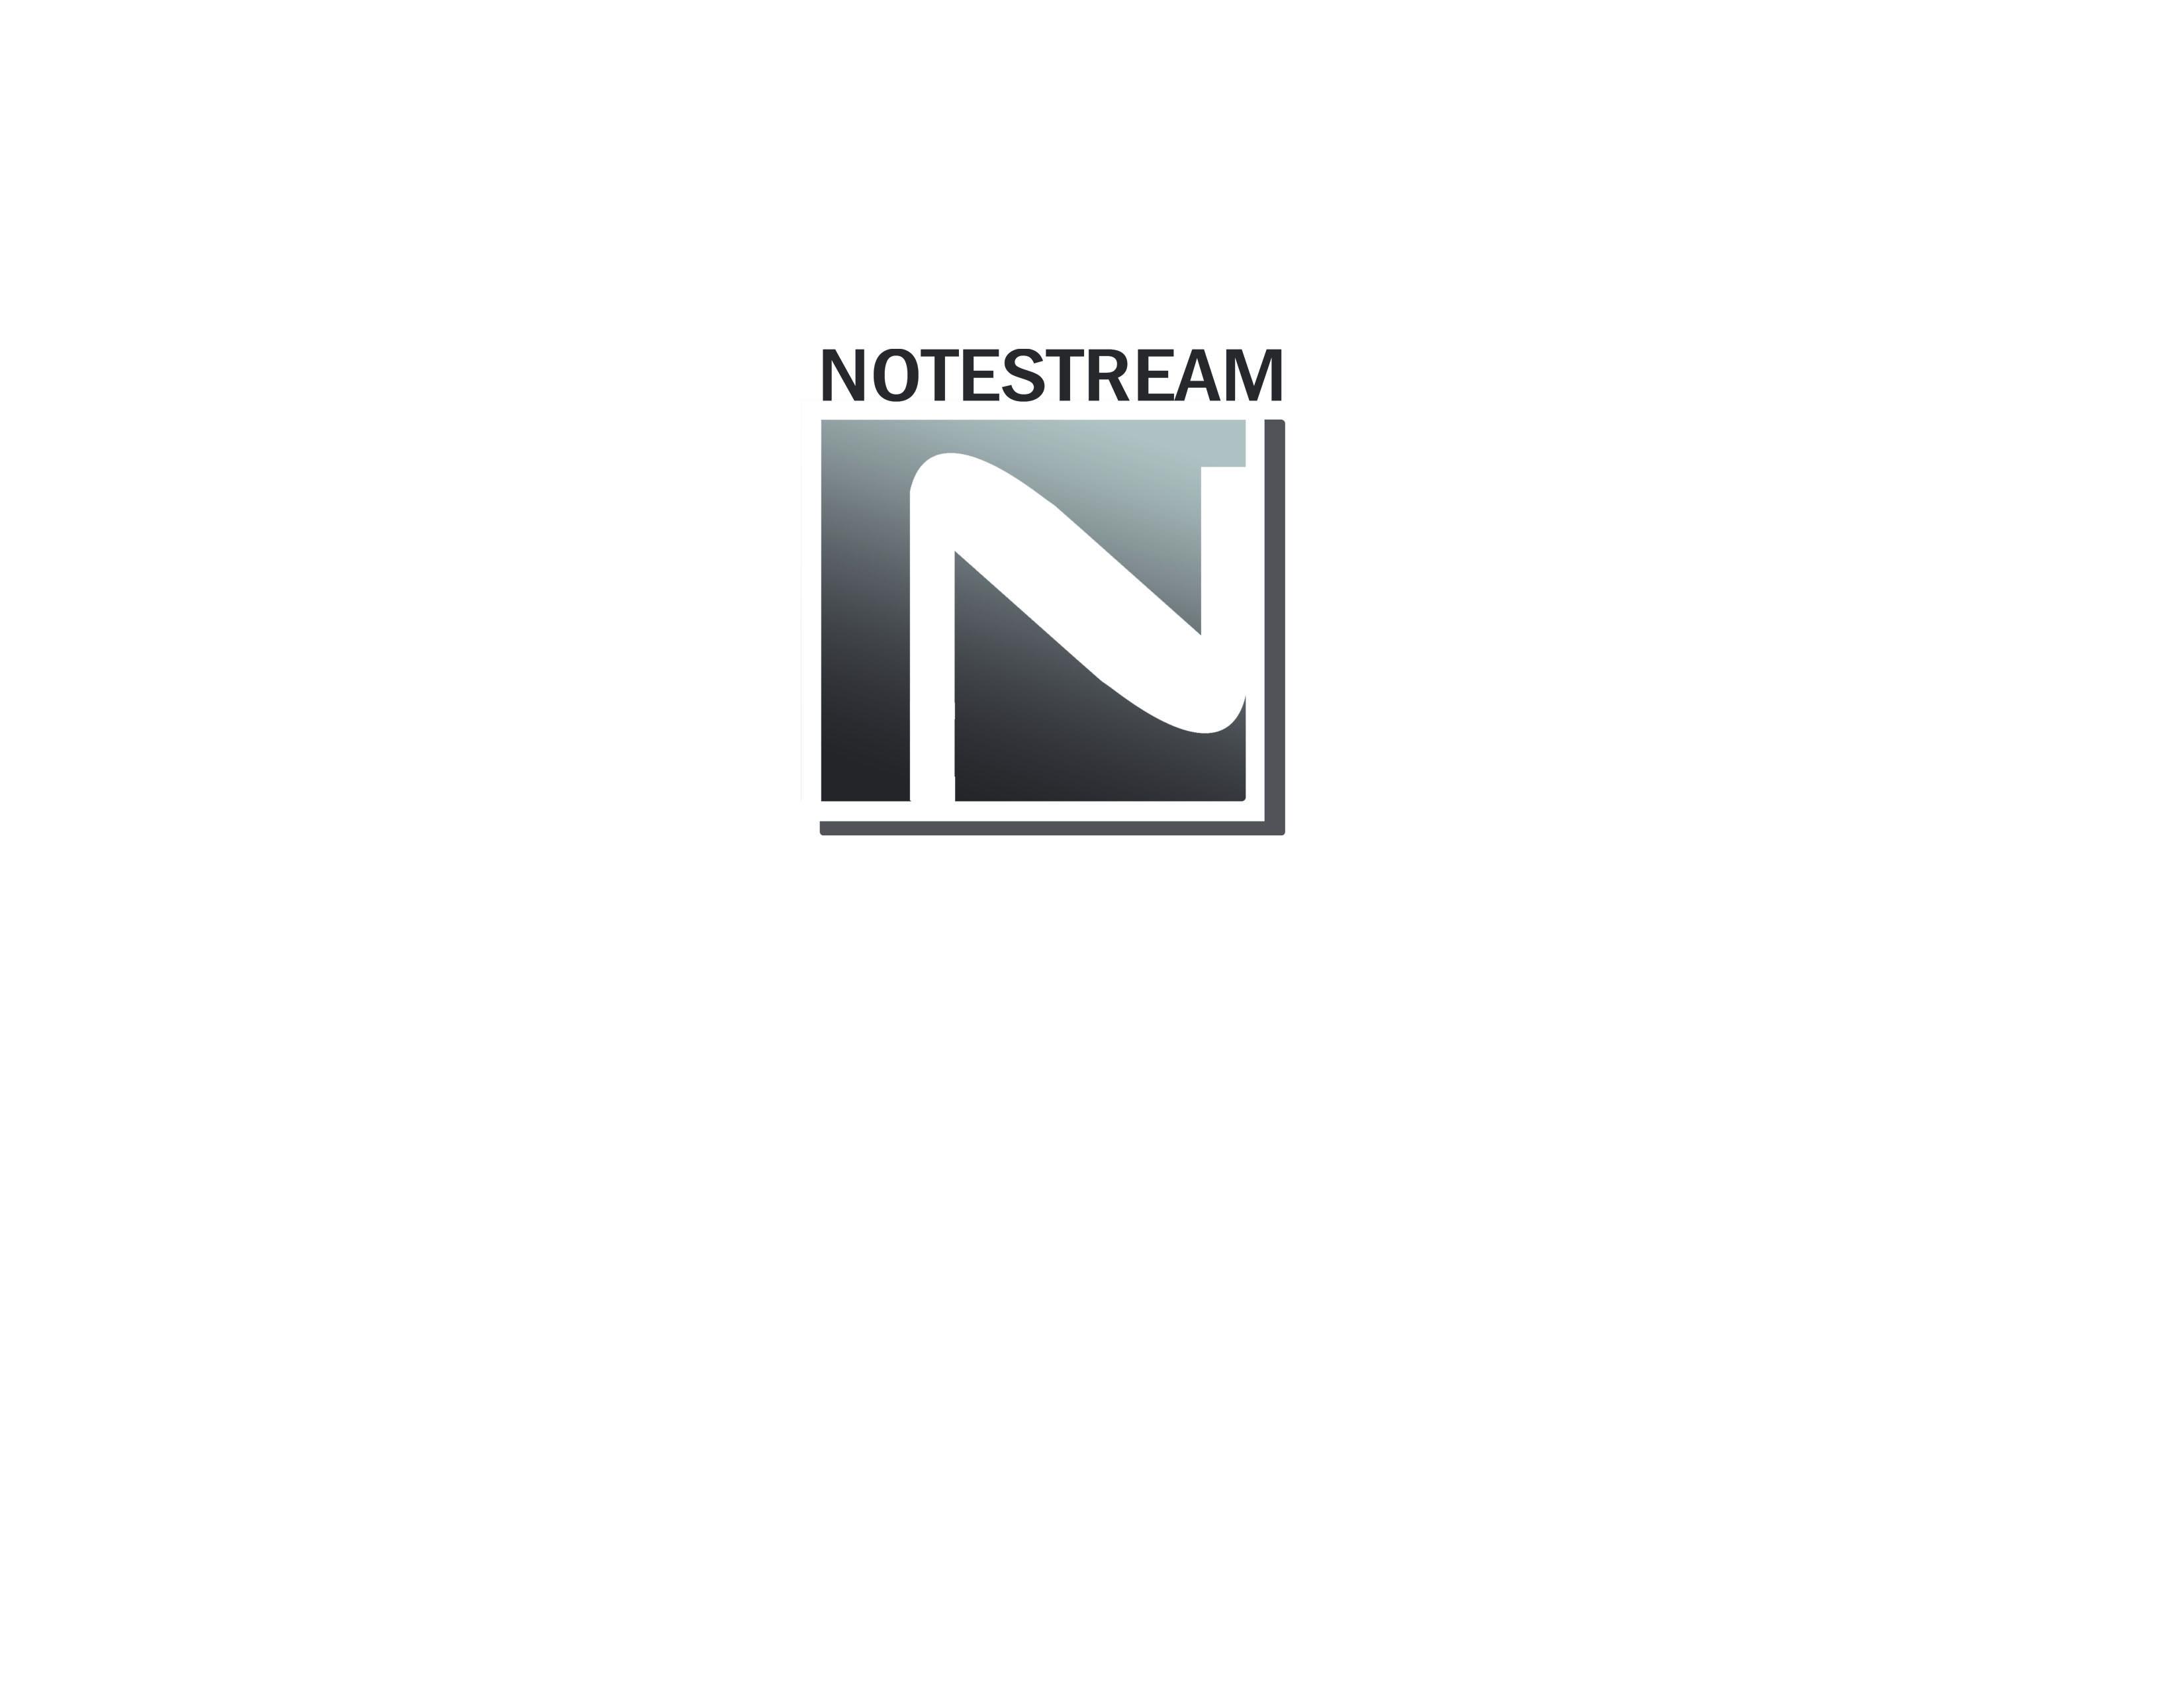 Logo Design by Alan Esclamado - Entry No. 81 in the Logo Design Contest Imaginative Logo Design for NoteStream.